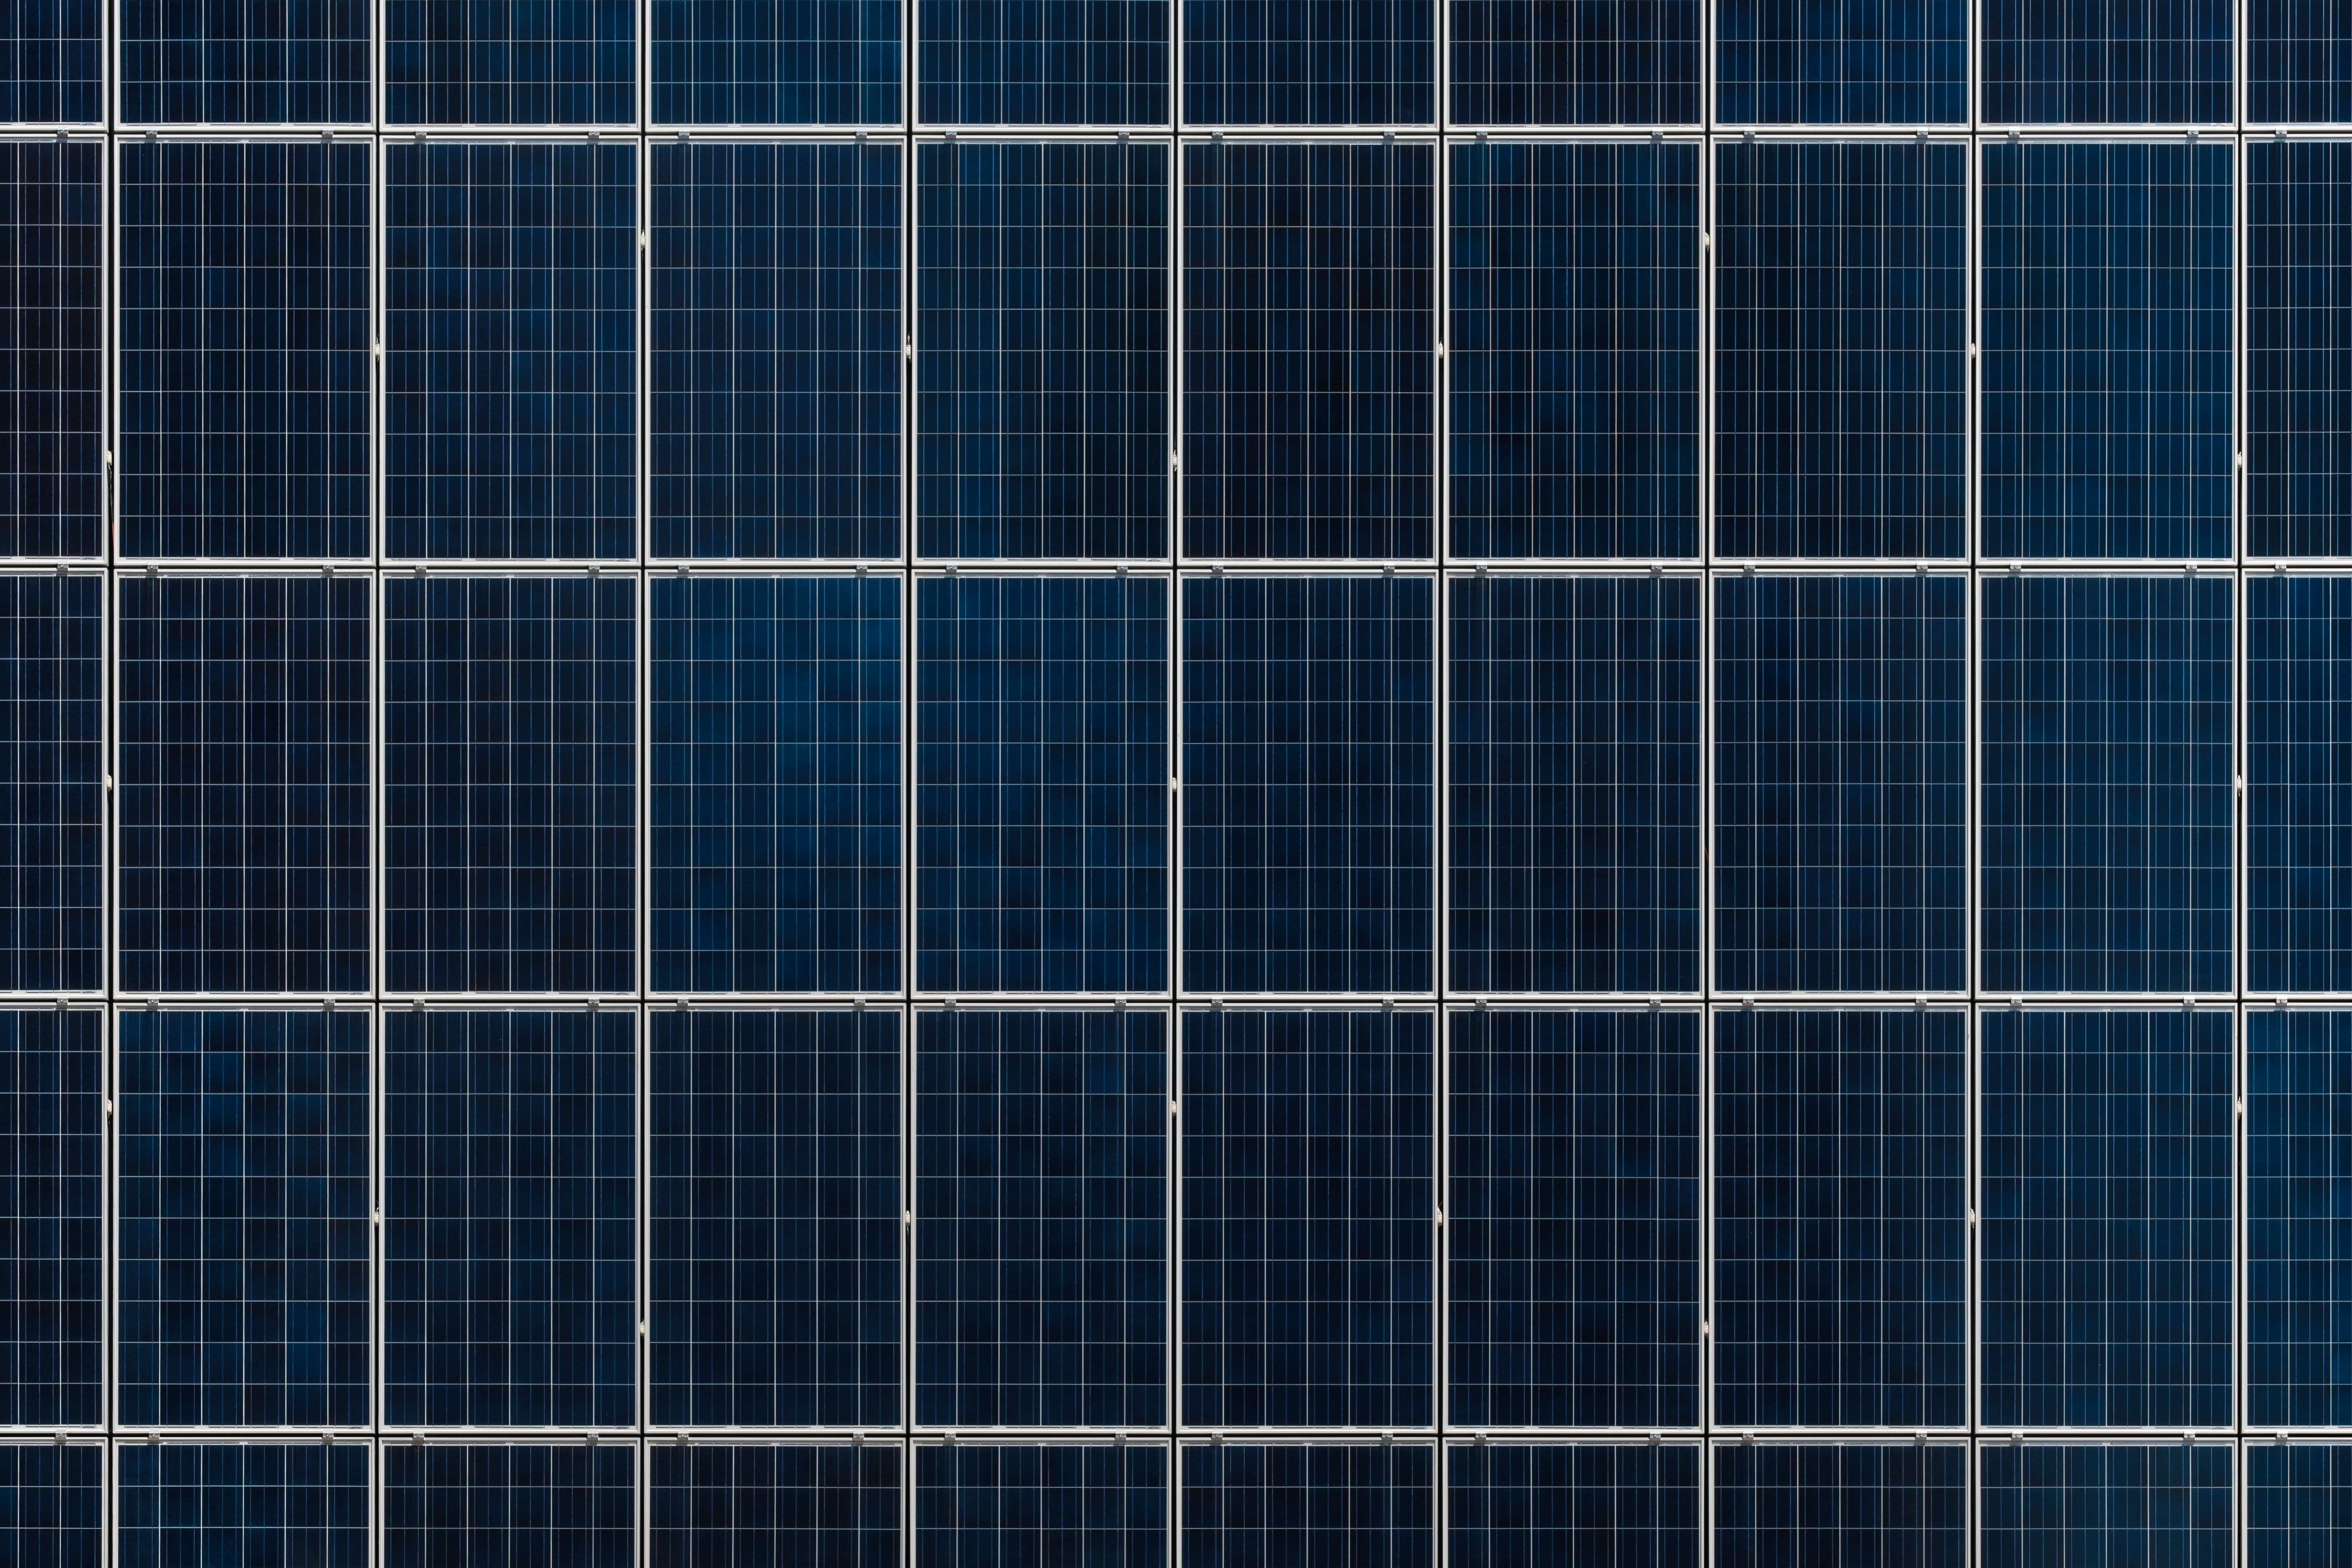 Painel fotovoltaico - Elysia energia solar Rio Grande do Sul Porto Alegre